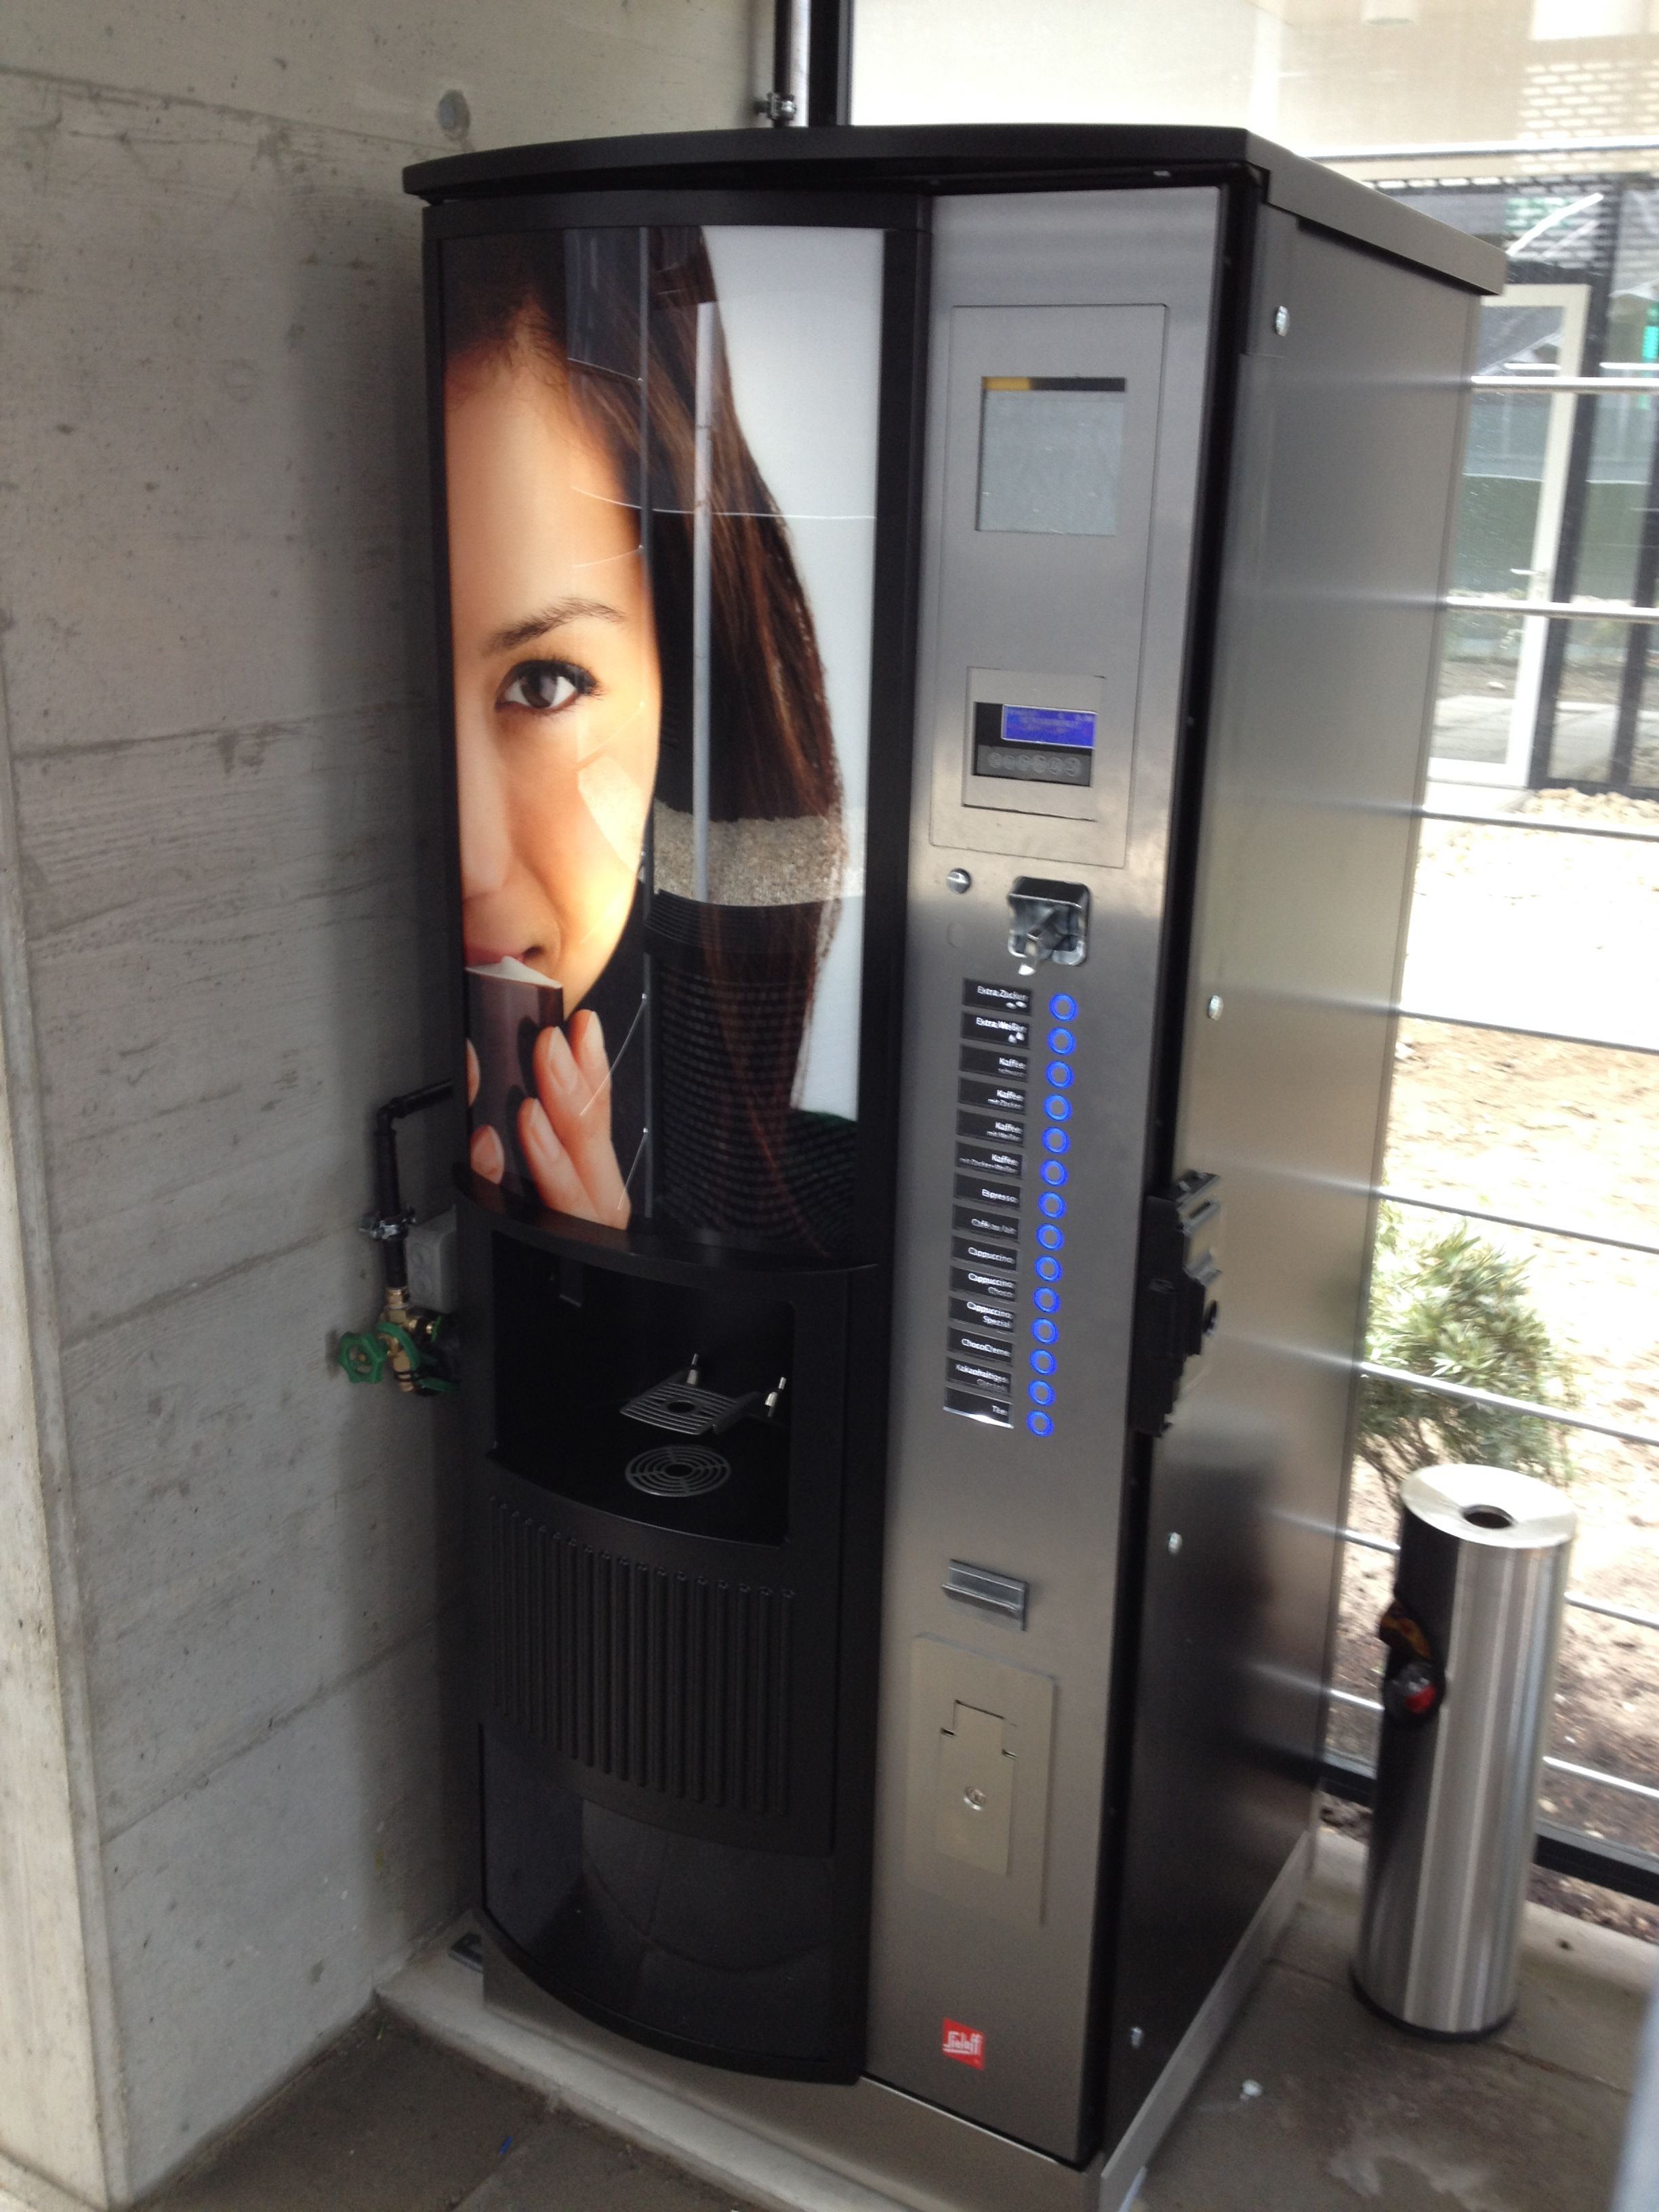 Outdoor Sielaff CIS 500; Instant Coffee Machine #drinksandsnacks